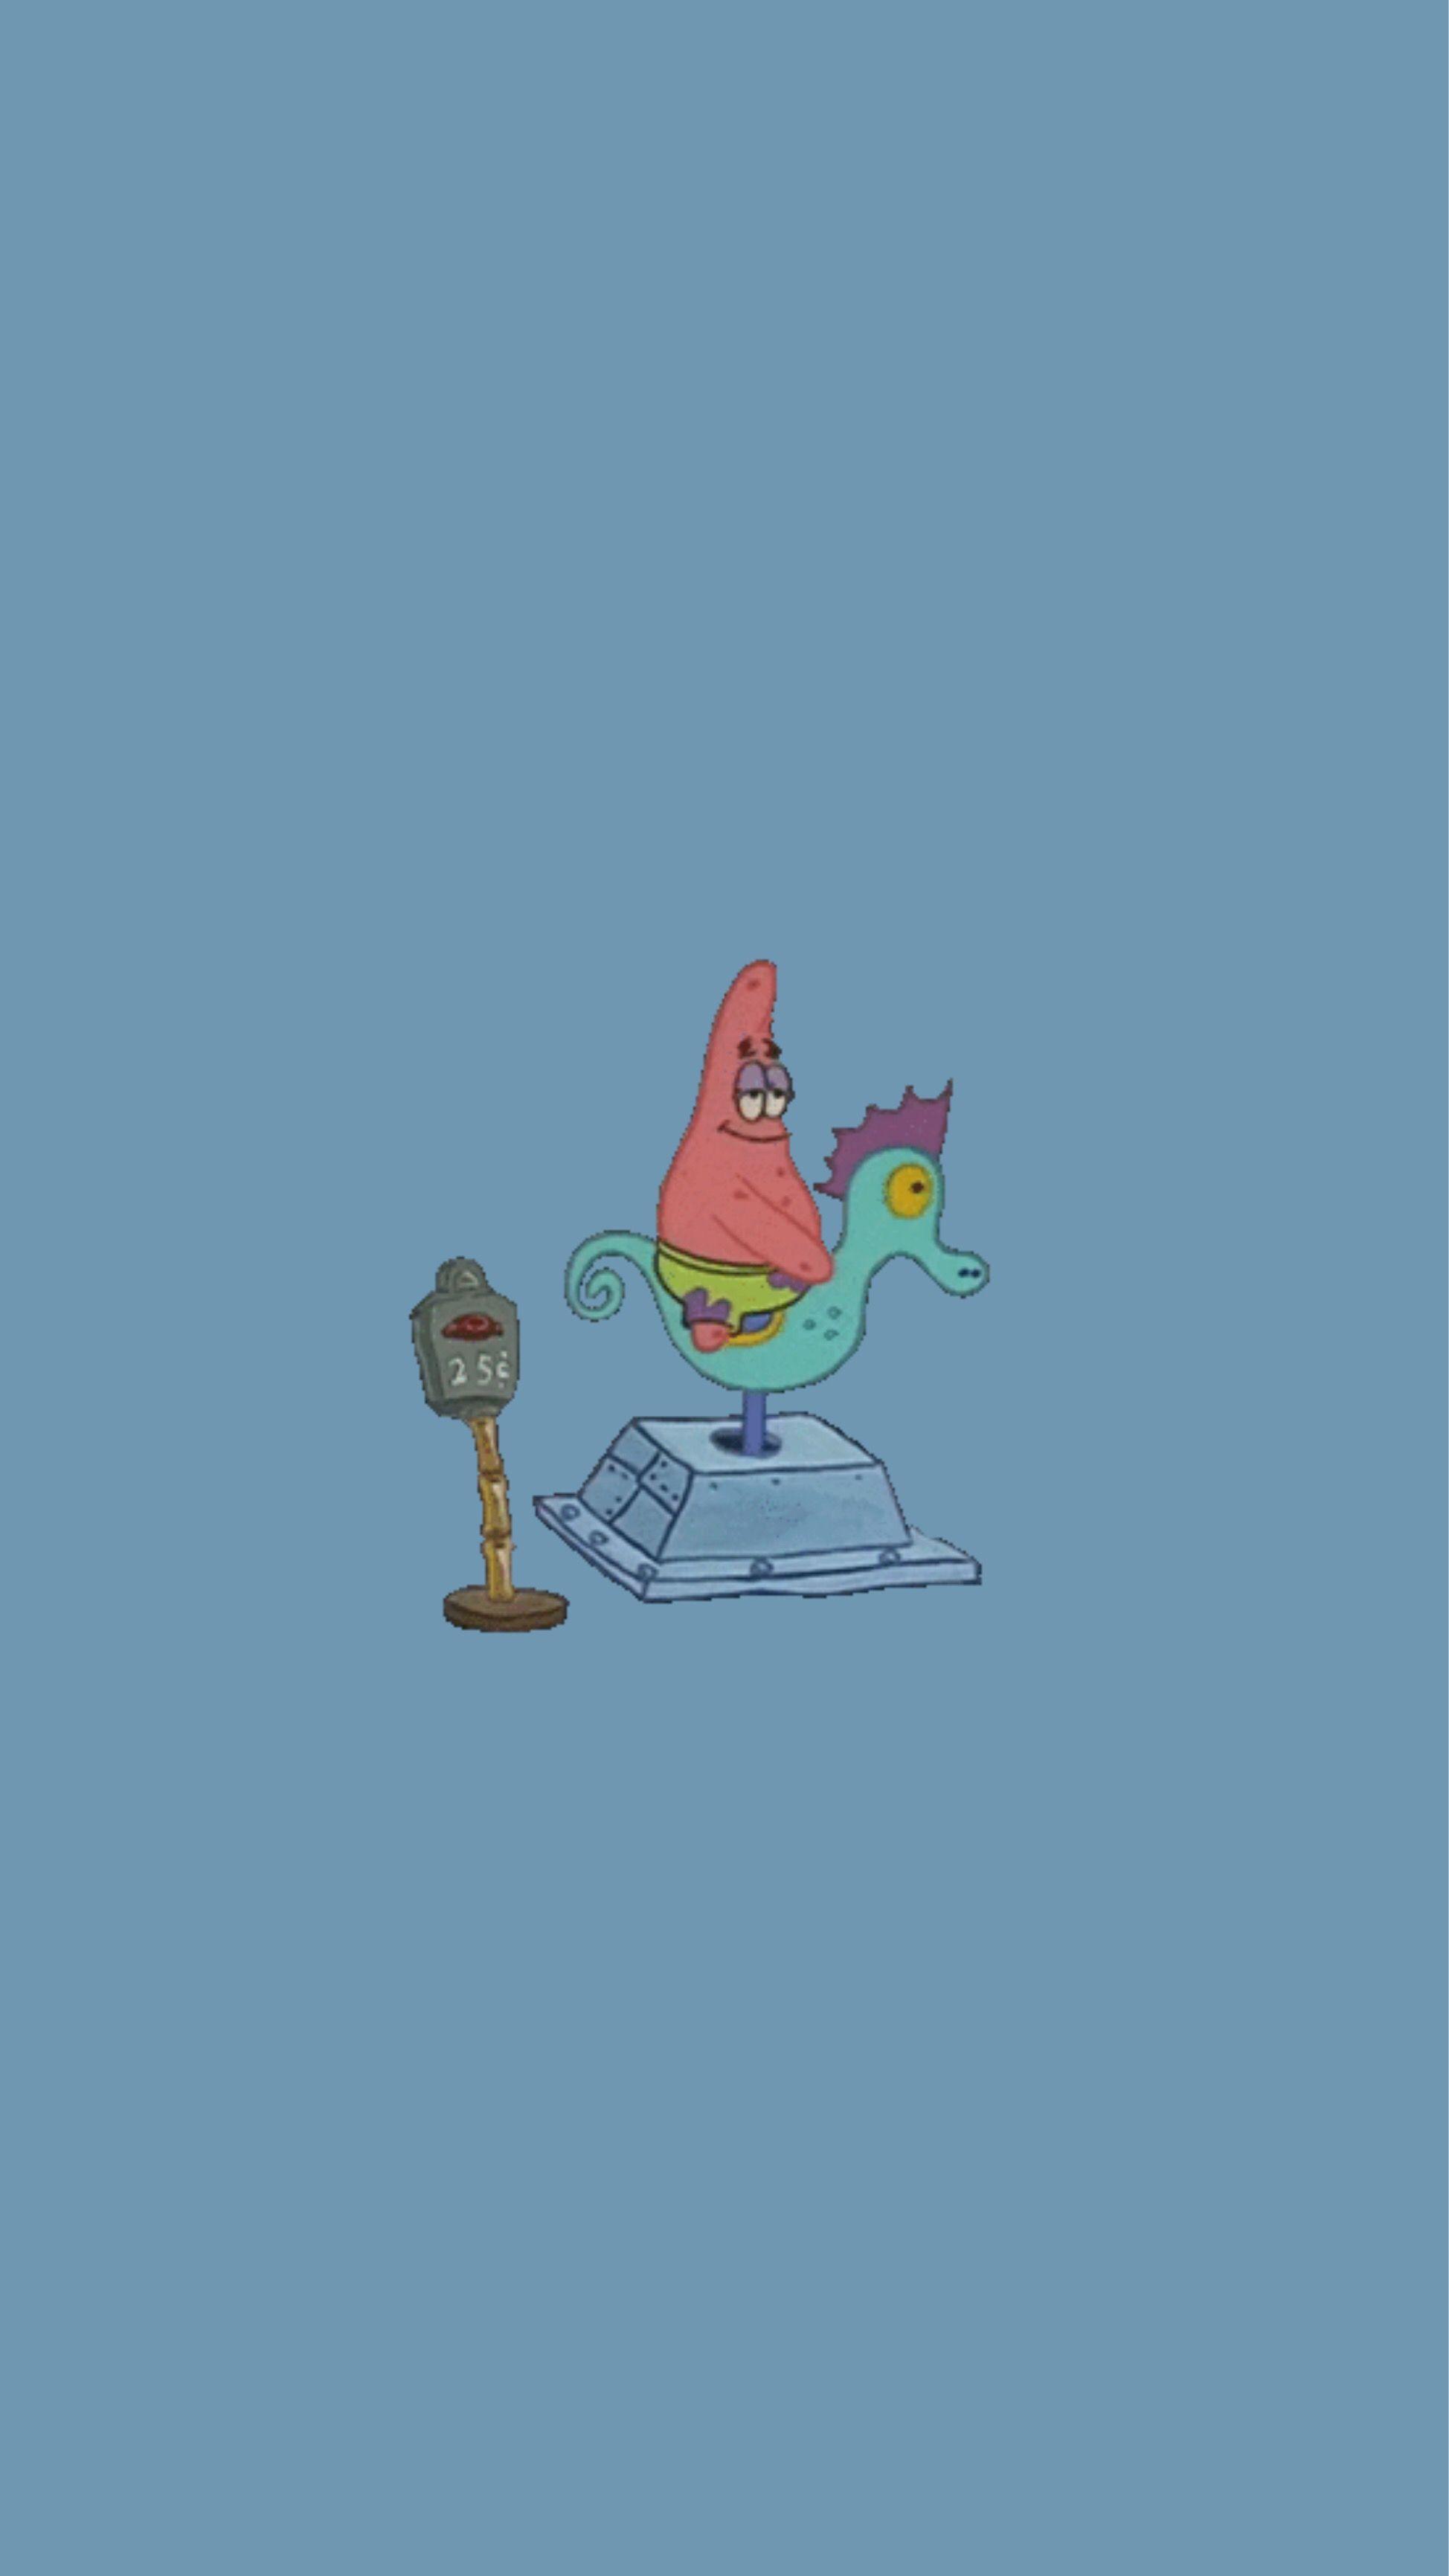 Aesthetic Wallpaper Cute Cartoon Wallpapers Cartoon Wallpaper Iphone Spongebob Wallpaper